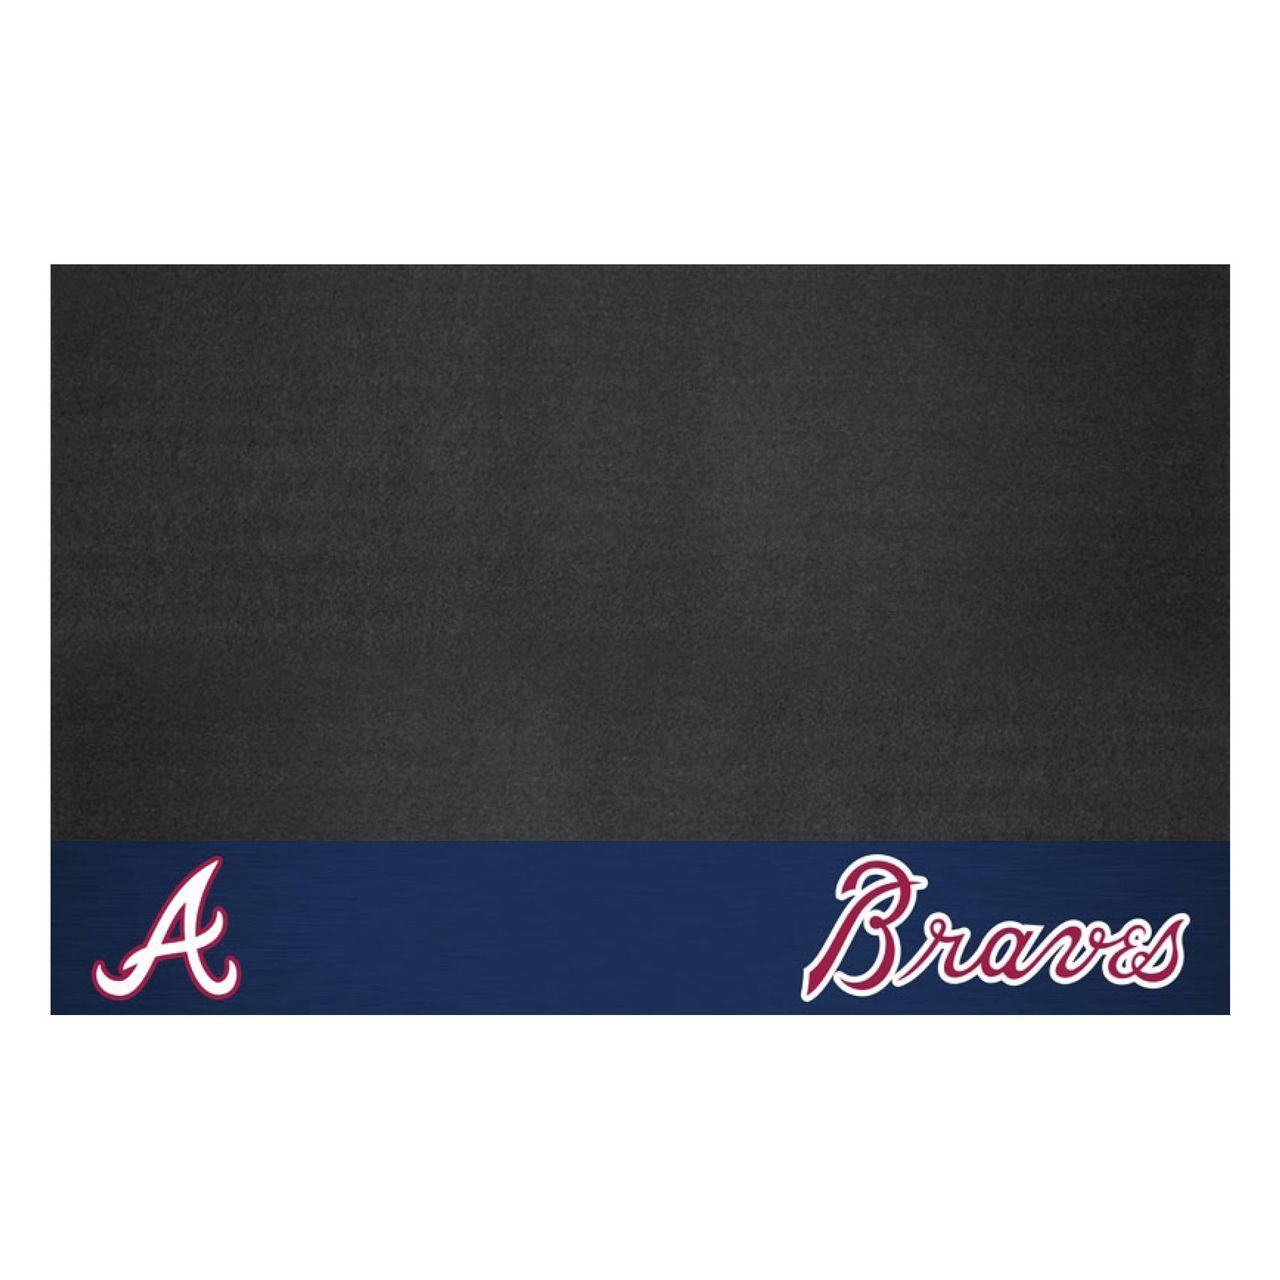 "Fanmats 12145 MLB - Atlanta Braves Grill Mat 26""x42"""